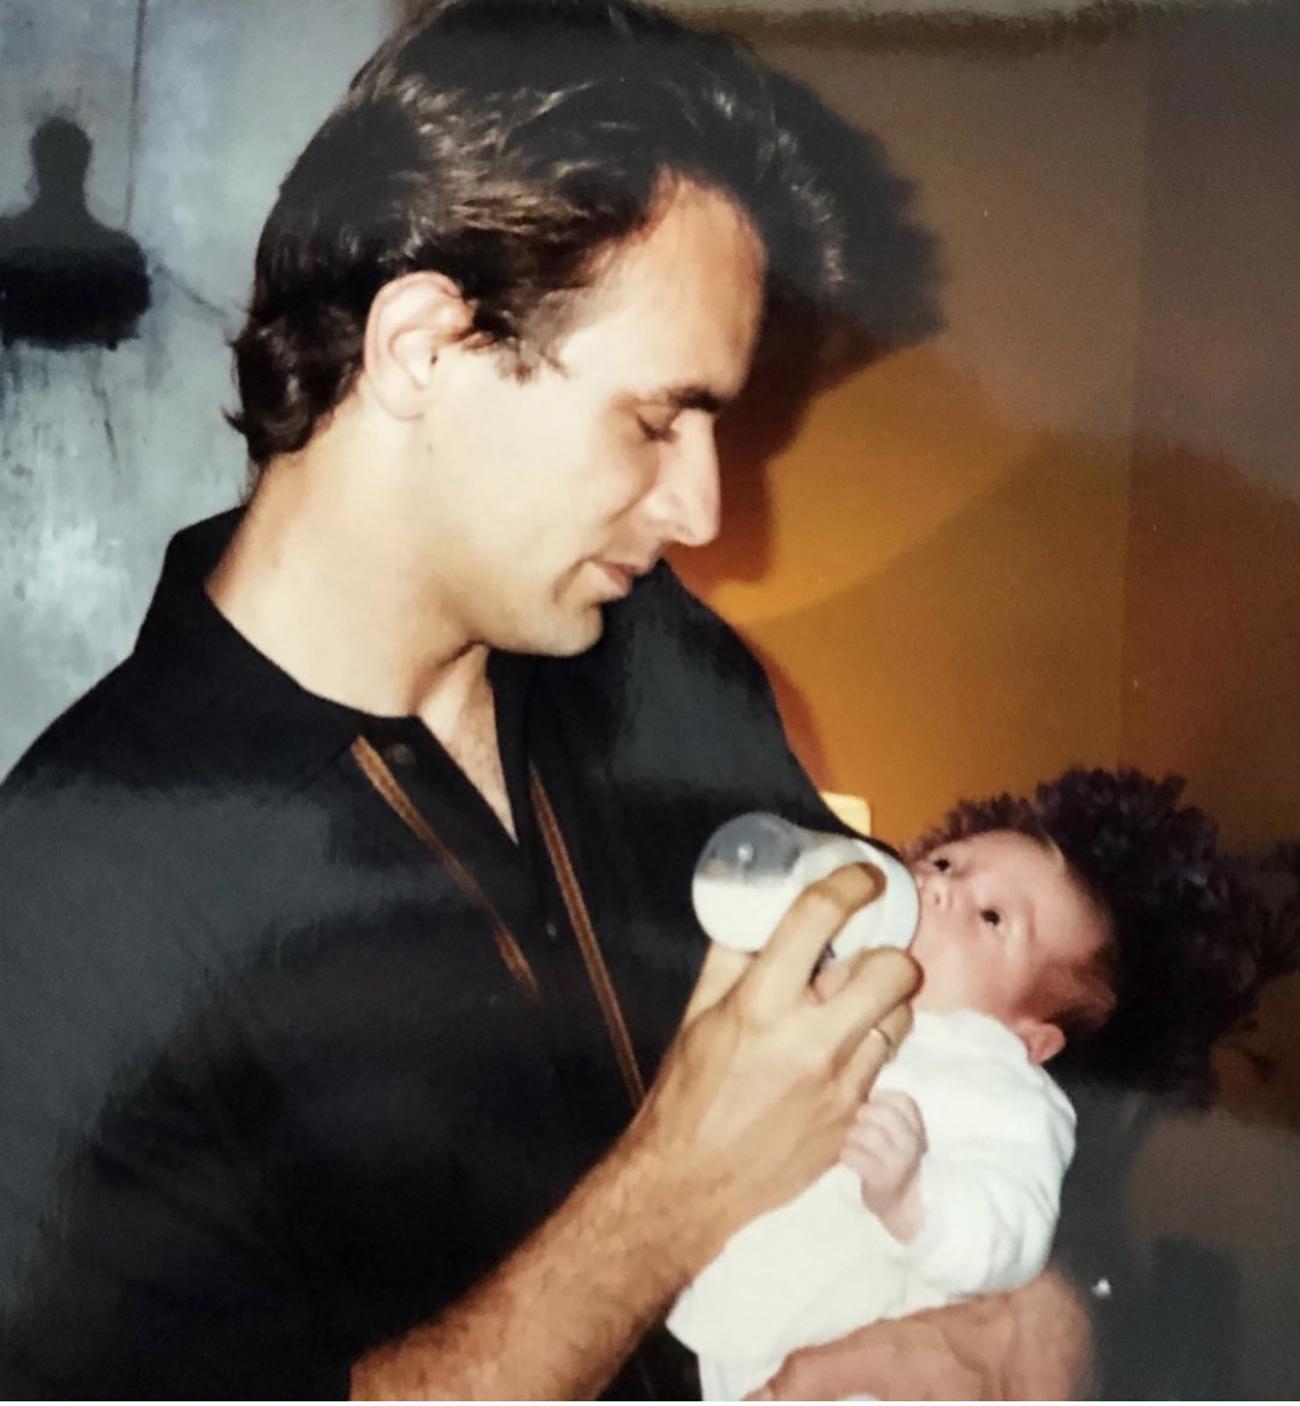 Lele Pons con su papa